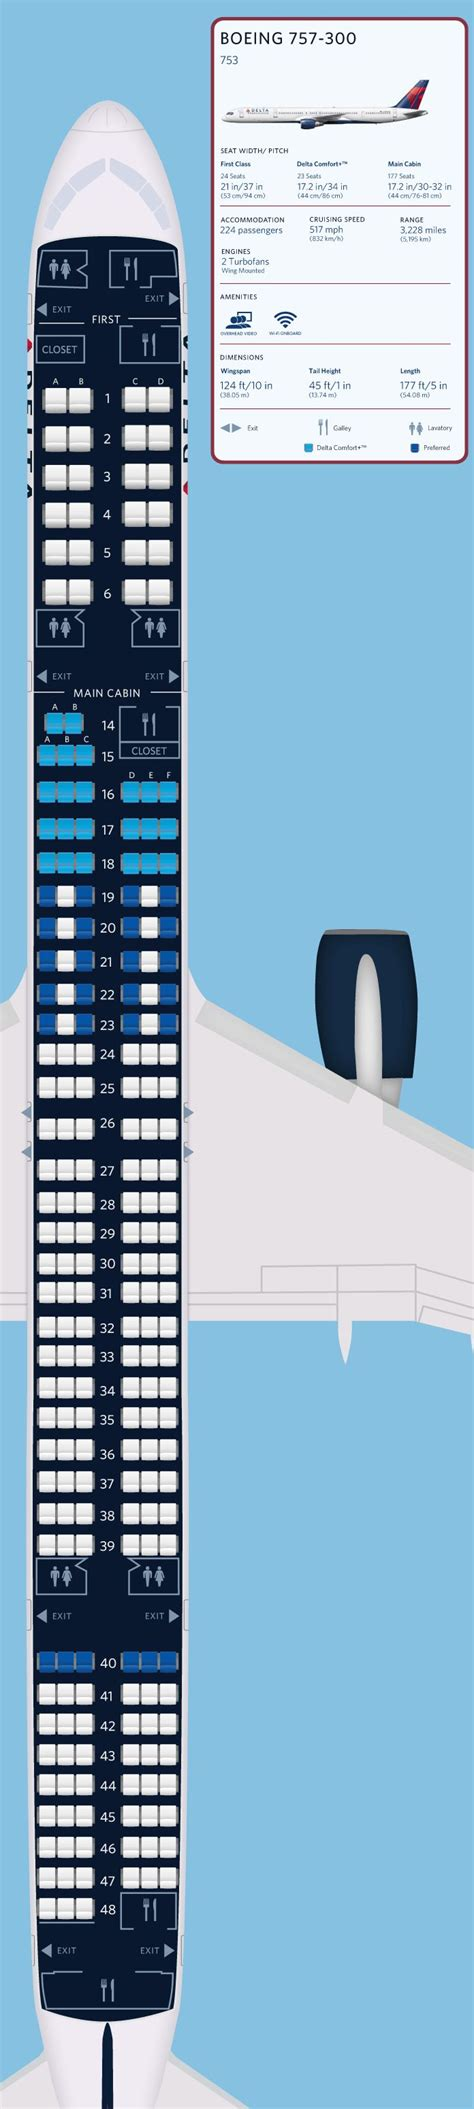 Icelandair 757 Seat Map Airplanes by 15 Must See Boeing 757 300 Pins Airbus A380 Boeing 787